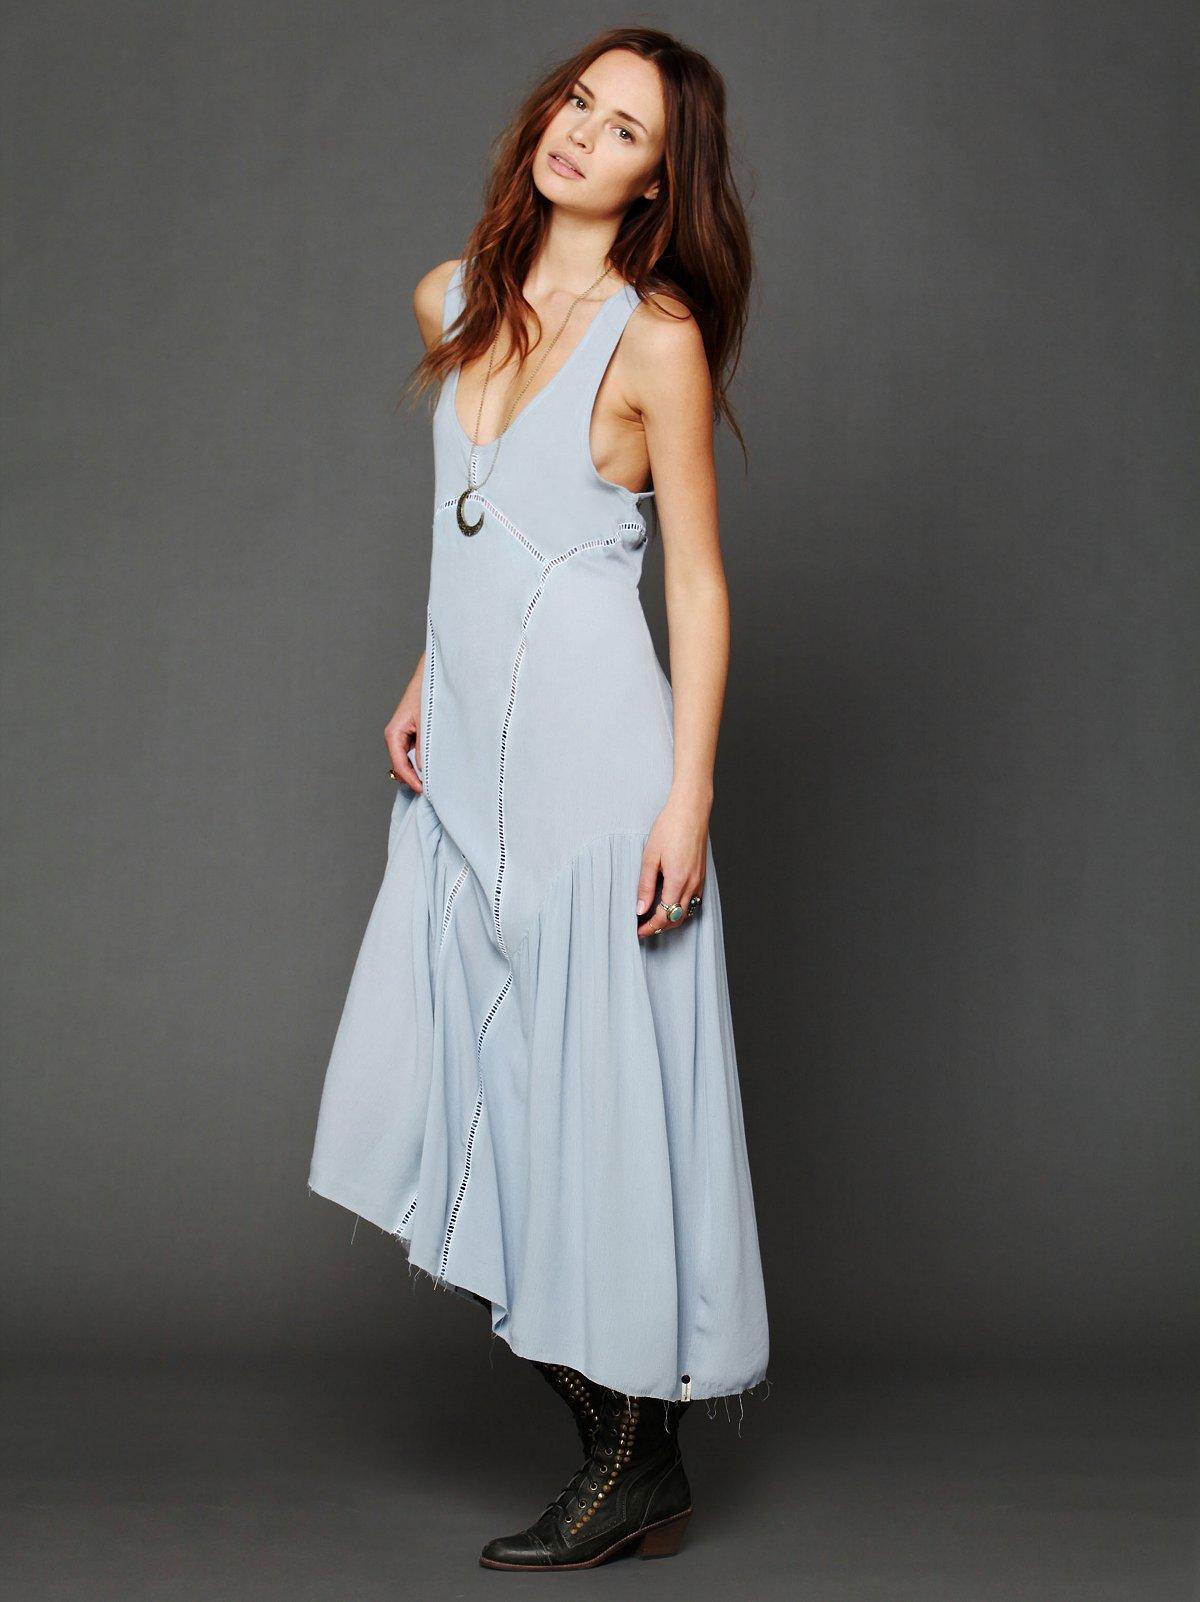 Dirty Cash Maxi Dress